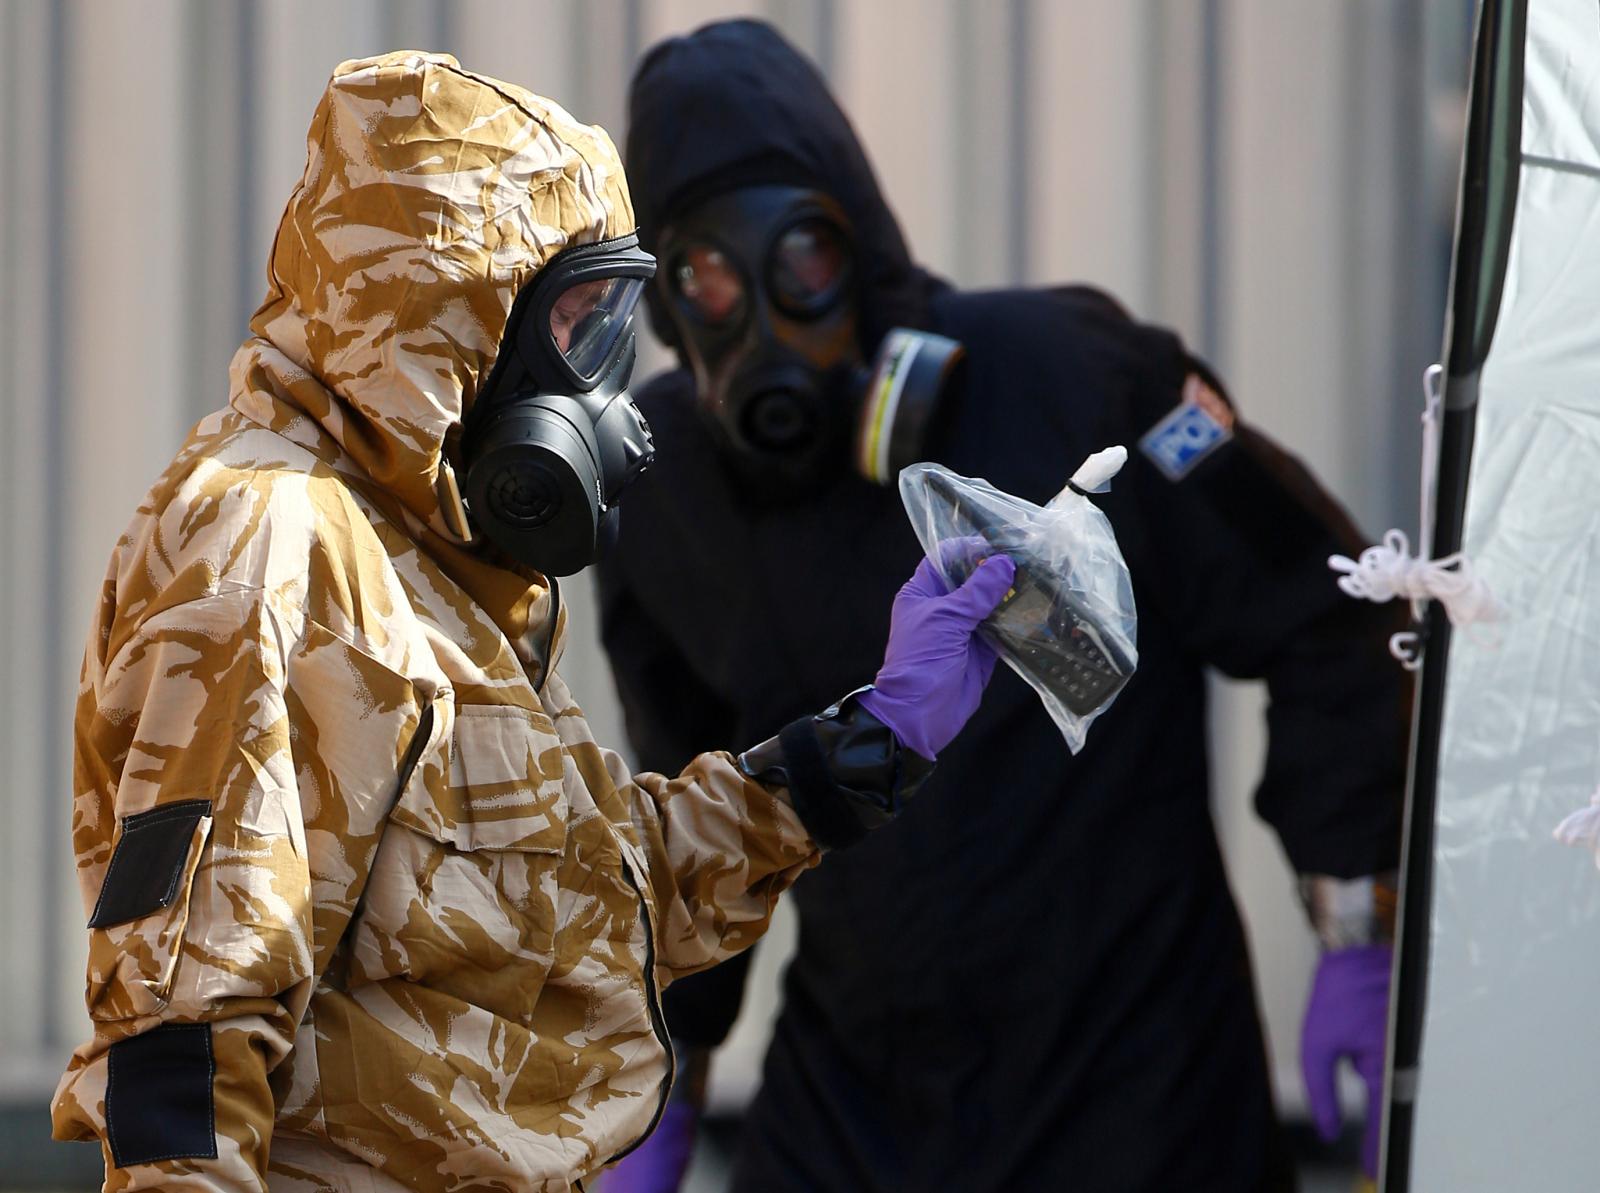 Salisbury Novichok poisoning